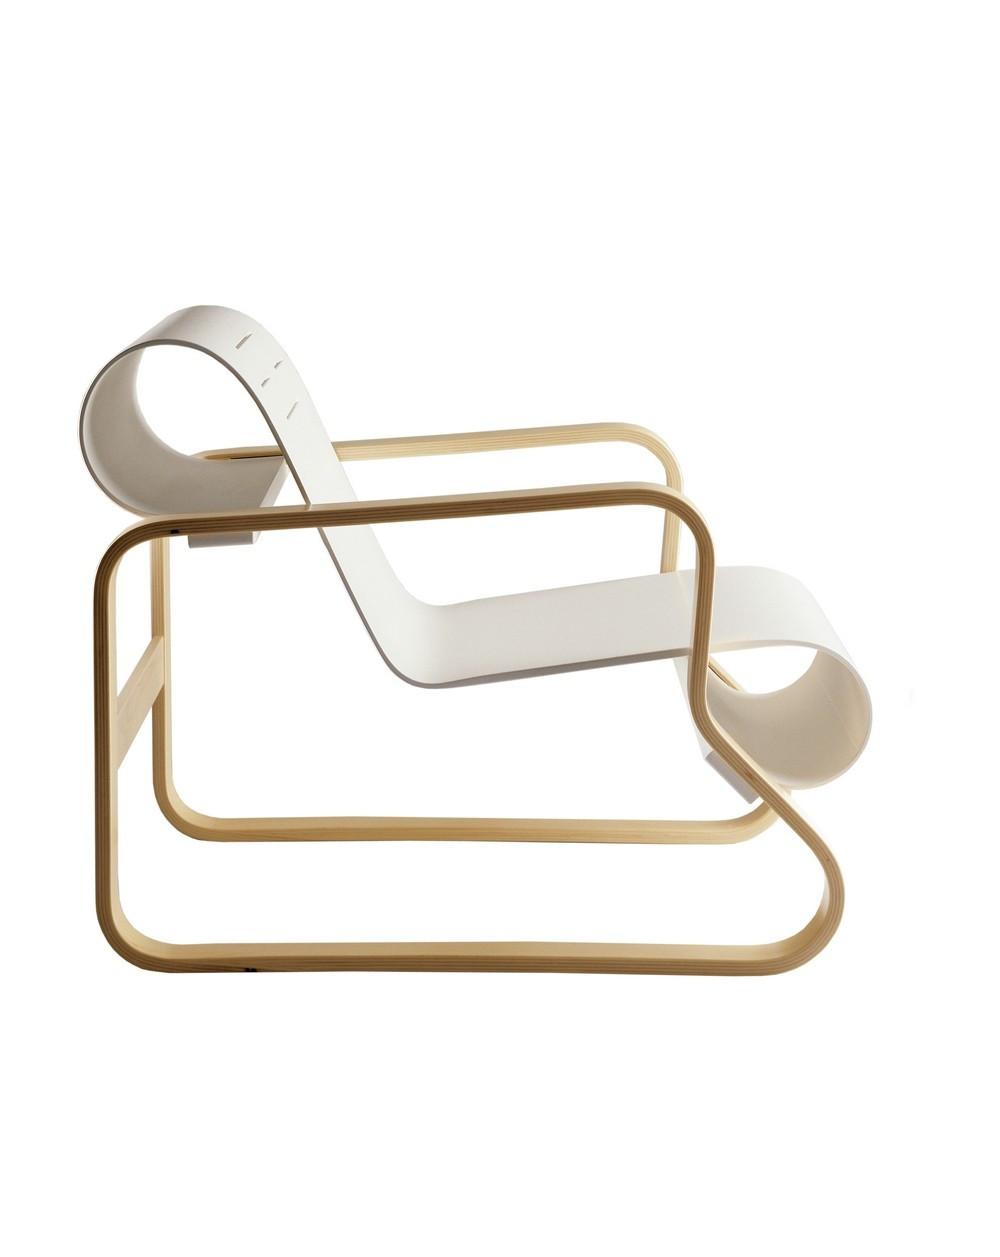 Armchair Paimio 41 Design Alvar Aalto for Artek